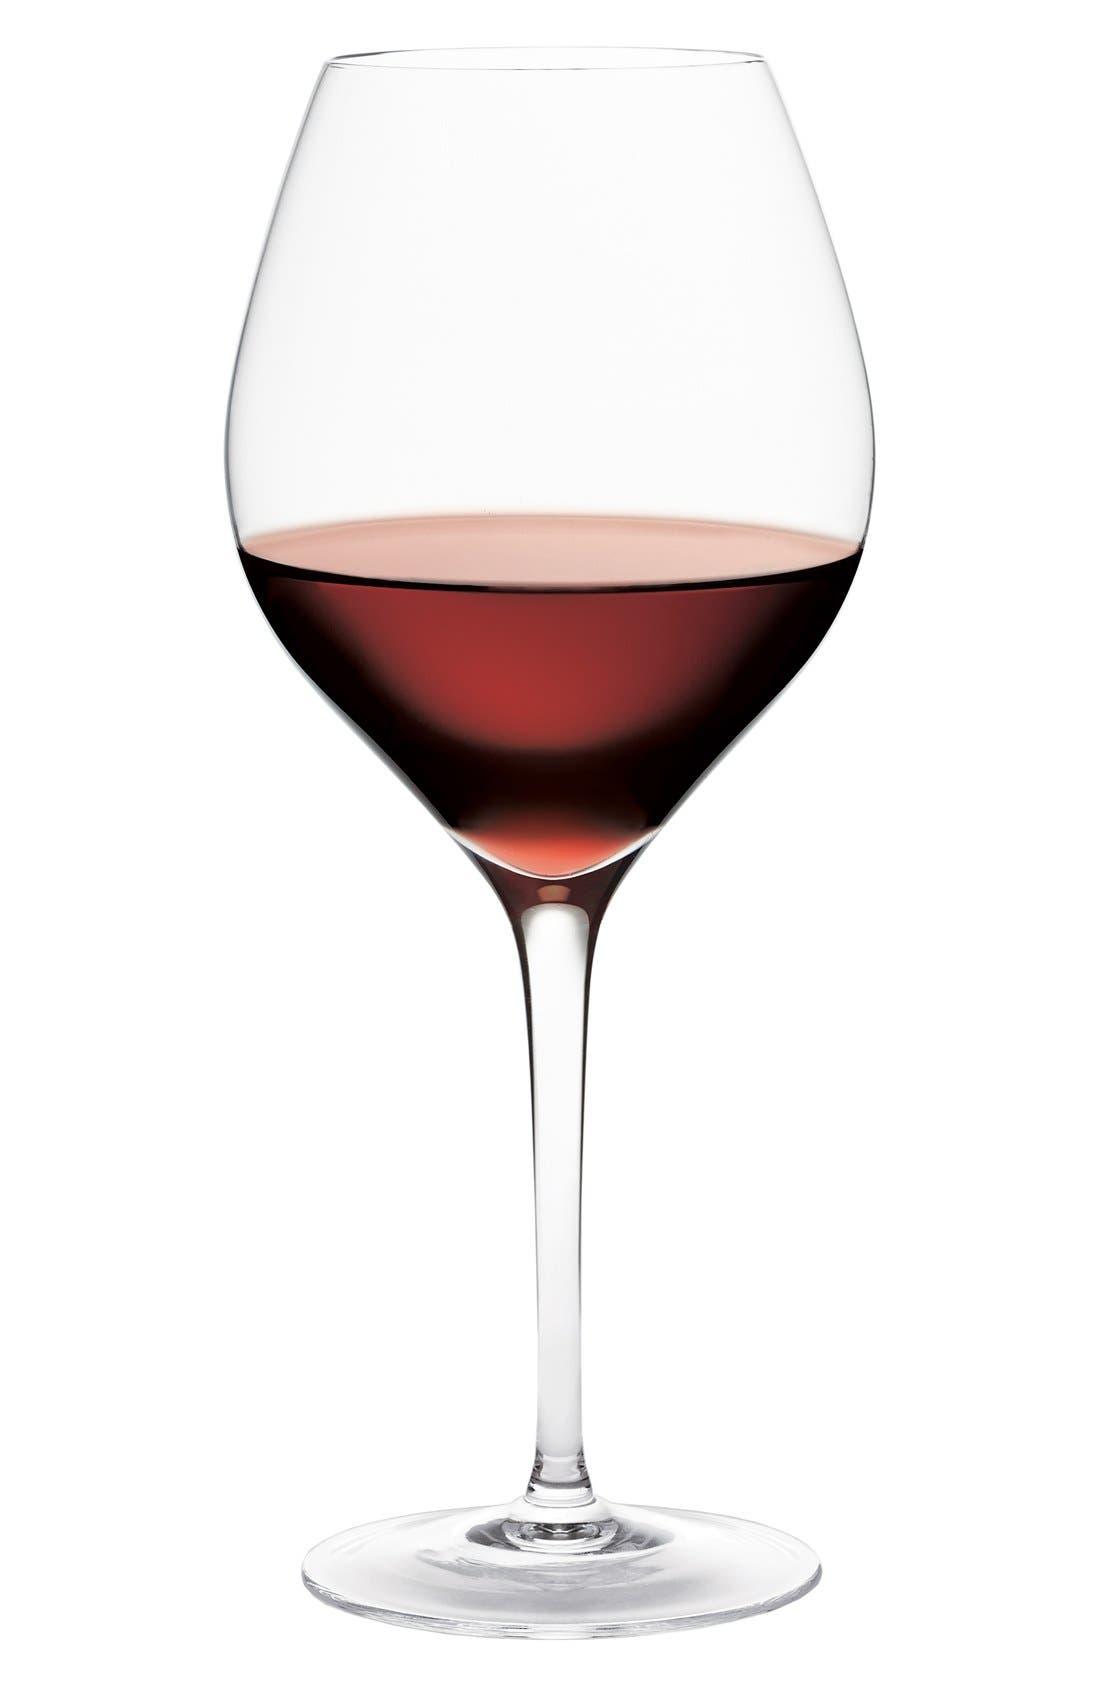 NORDSTROM AT HOME Ravenna Set of 4 Red Wine Glasses, Main, color, 960